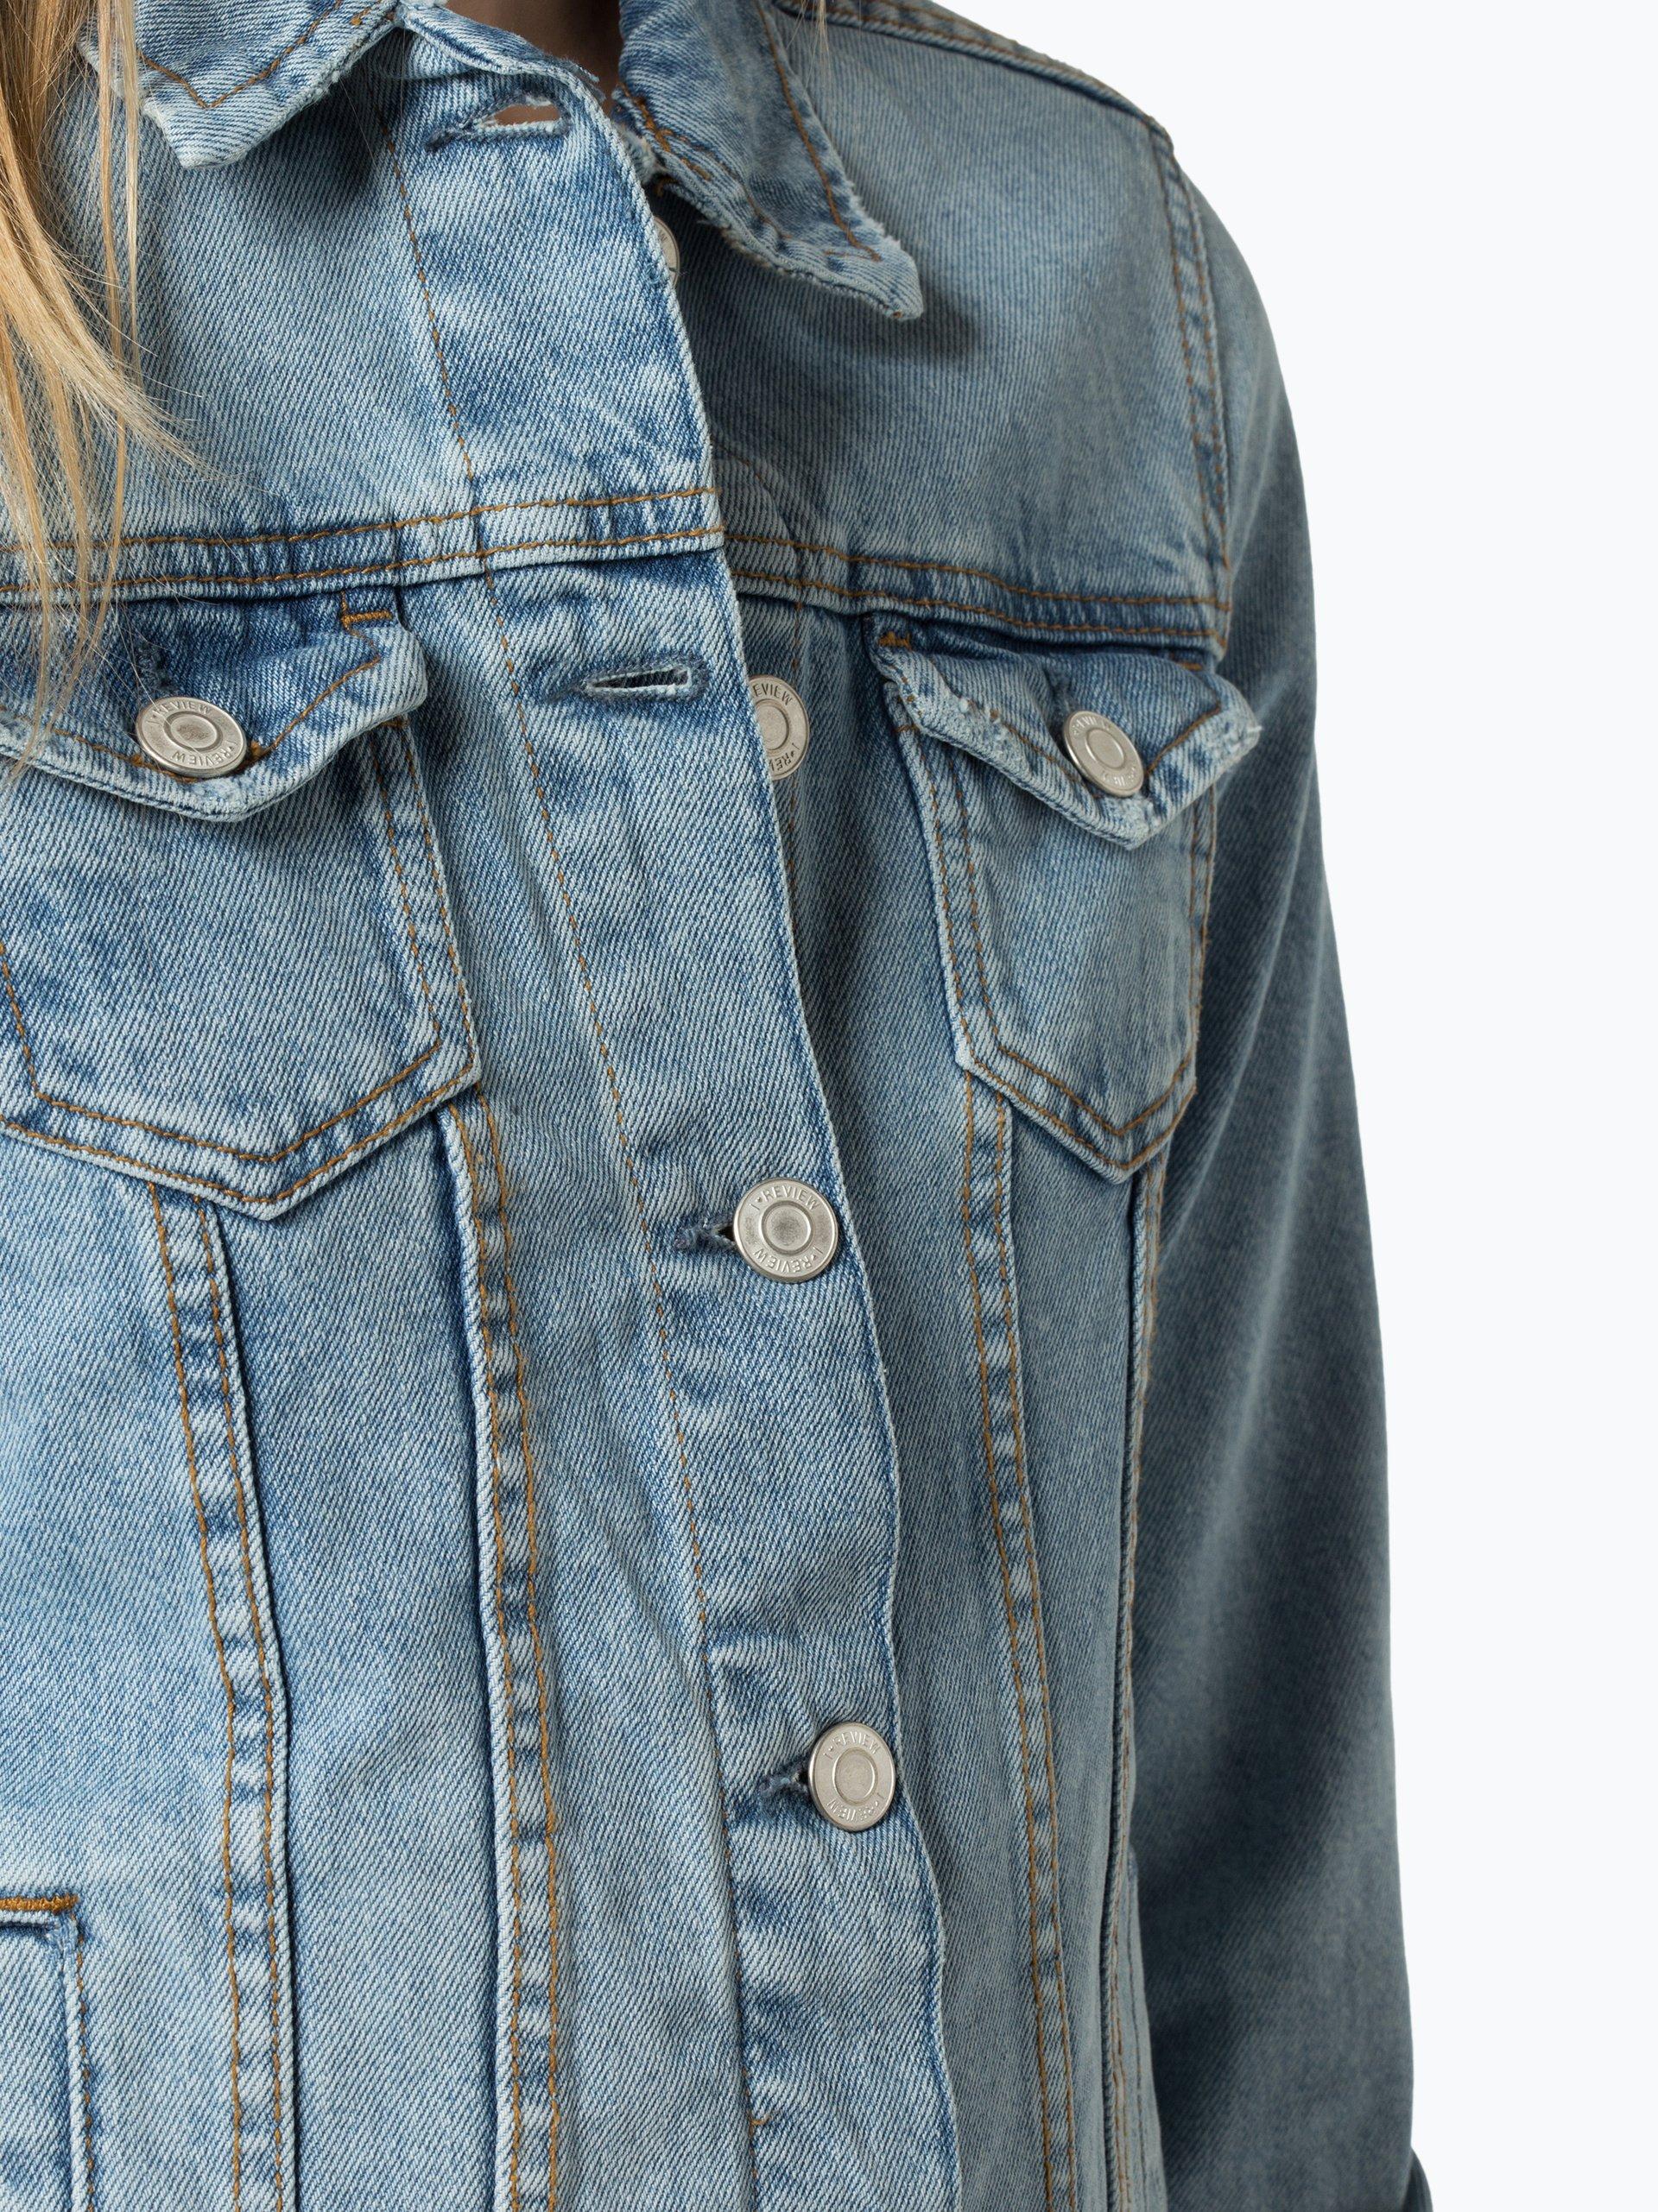 review damen jeansjacke hellblau uni online kaufen vangraaf com. Black Bedroom Furniture Sets. Home Design Ideas